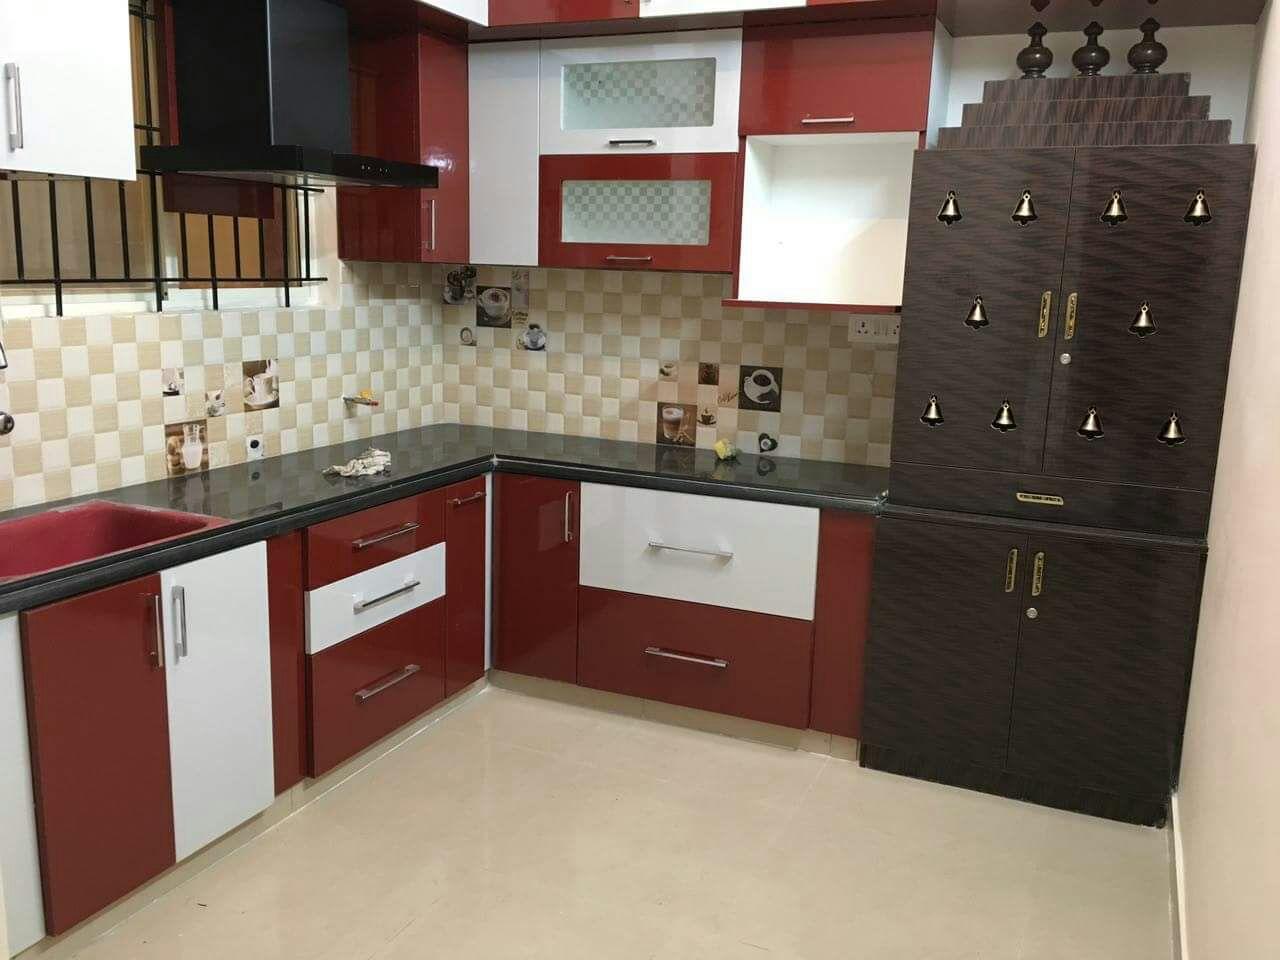 pooja room in kitchen somebuddy nagpur